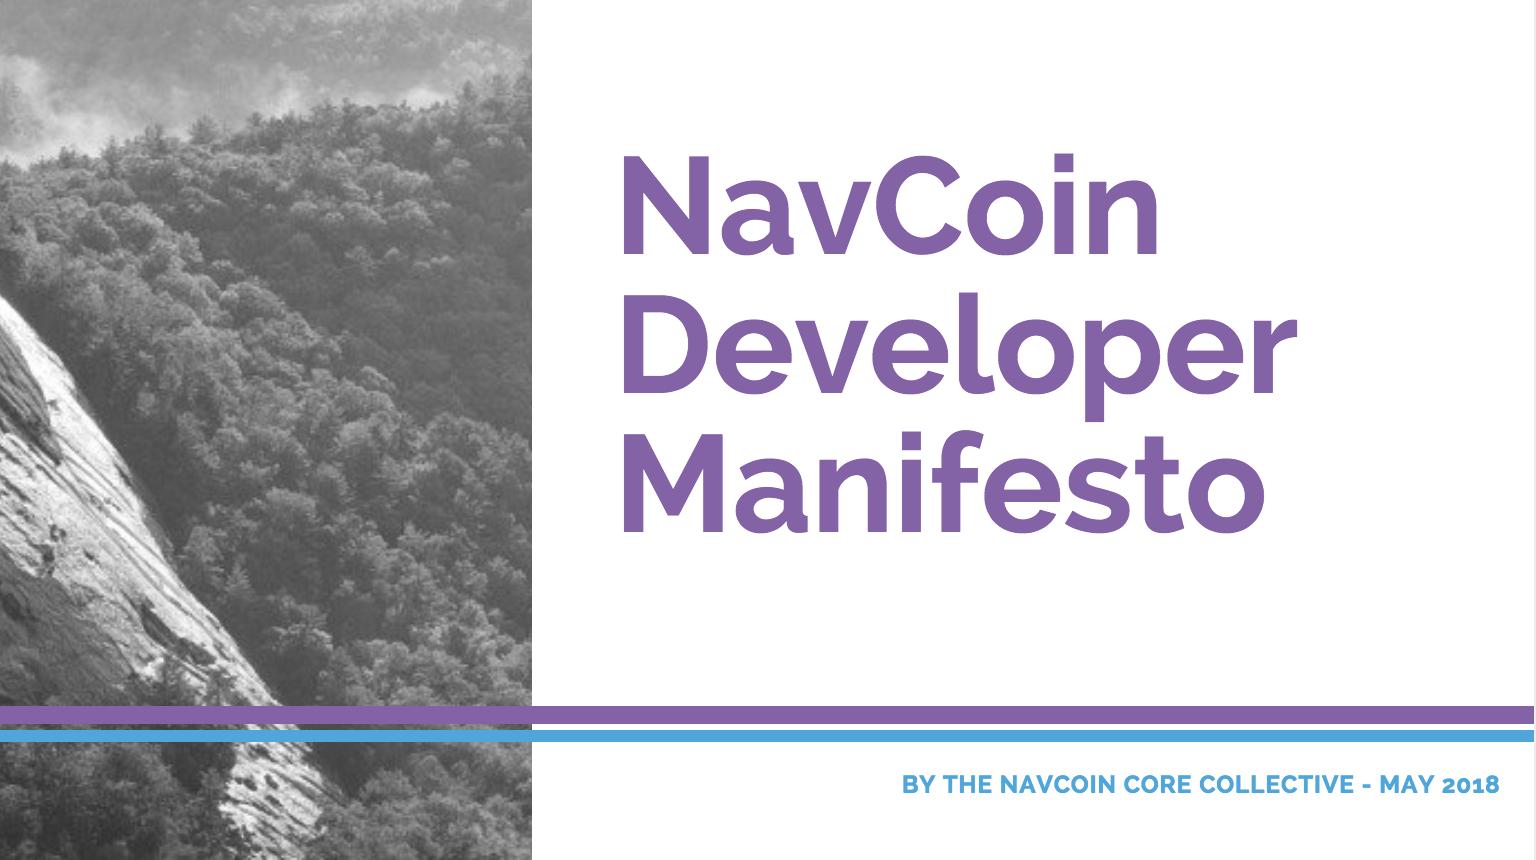 NavCoin Developer Manifesto